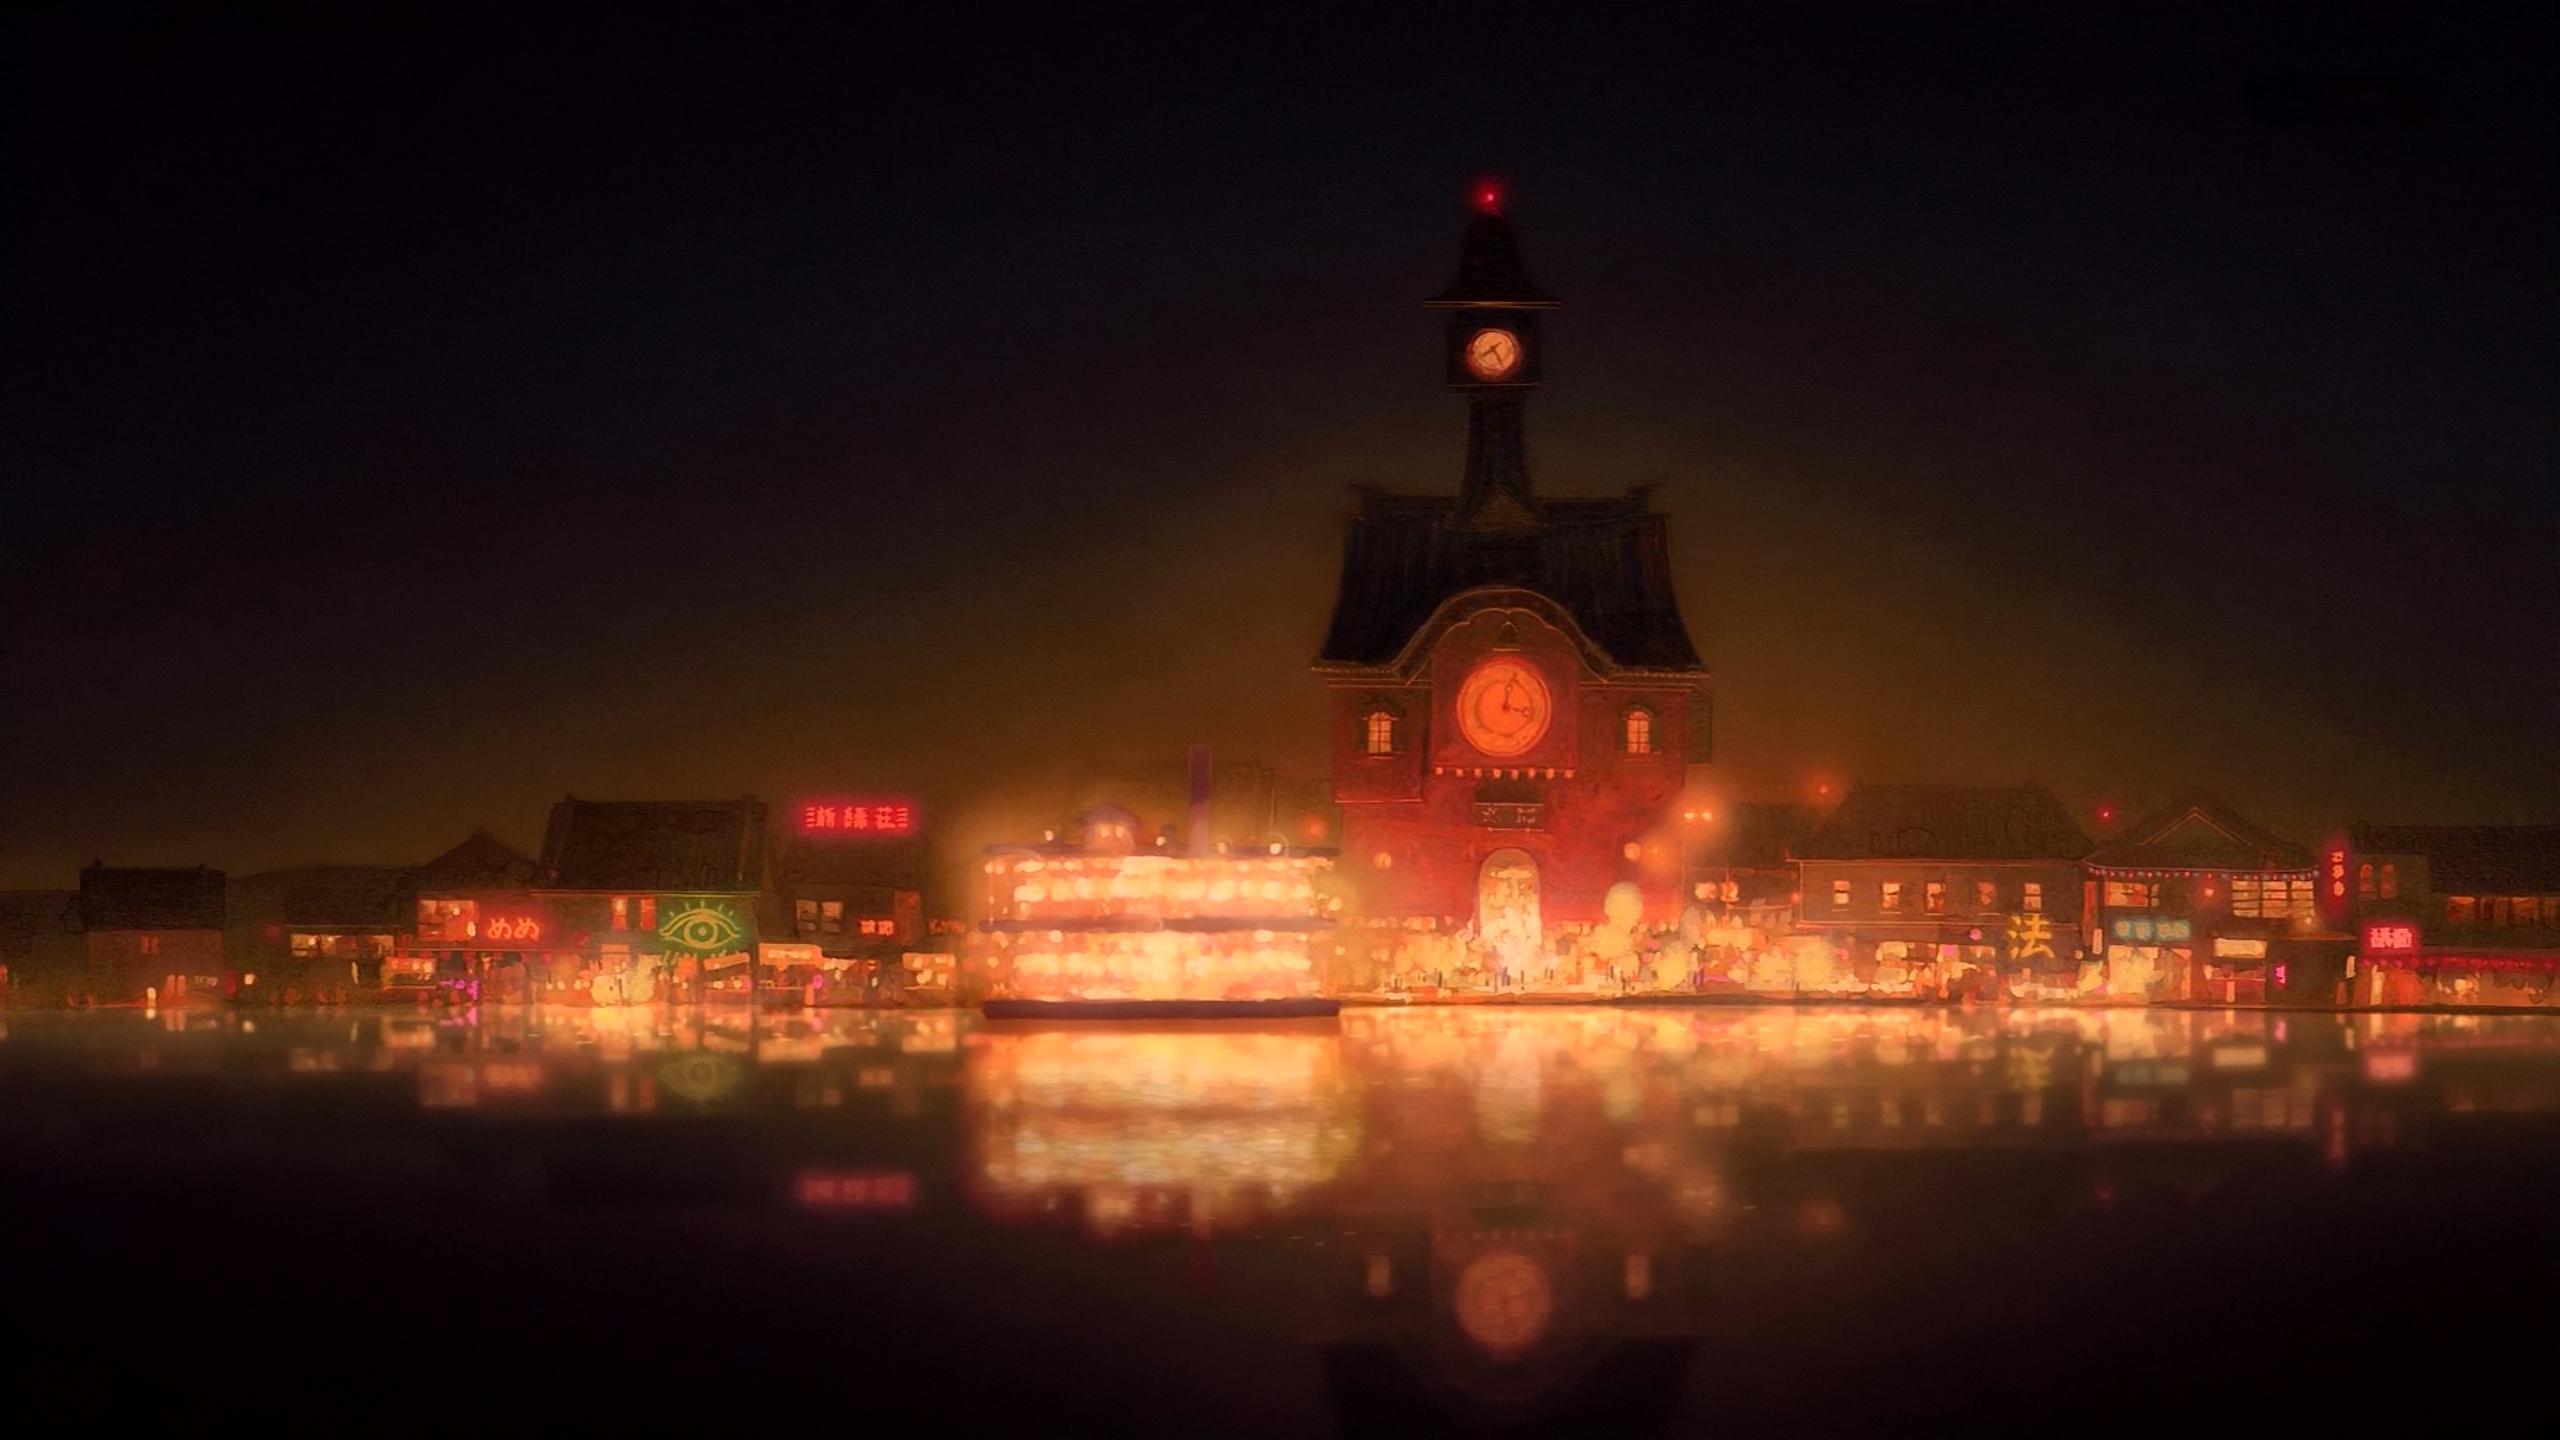 Jan 2016 Studio Ghibli Wallpaper background pack 2560x1440